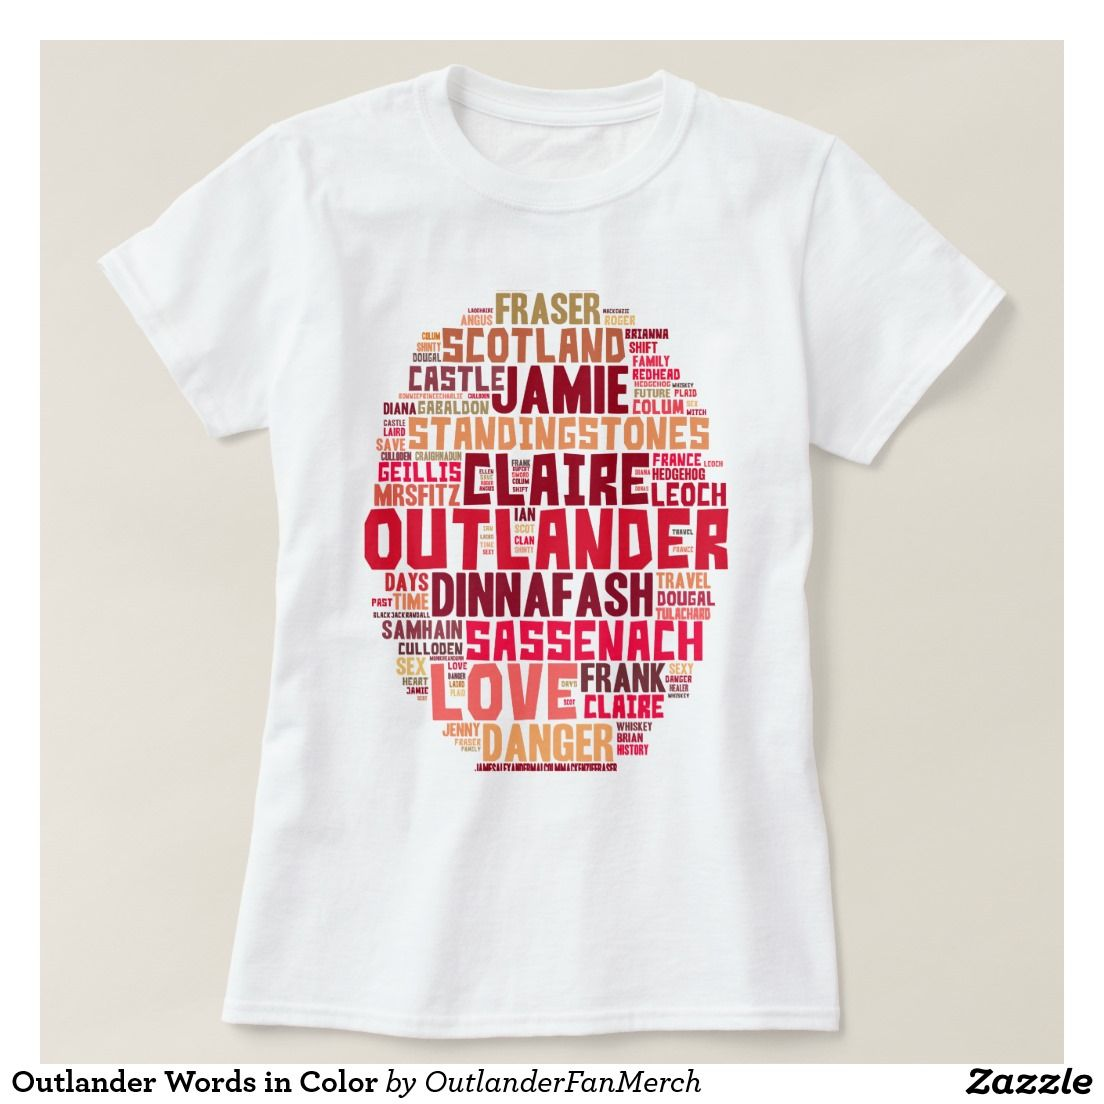 Zazzle t shirt design size - Outlander Words In Color T Shirt